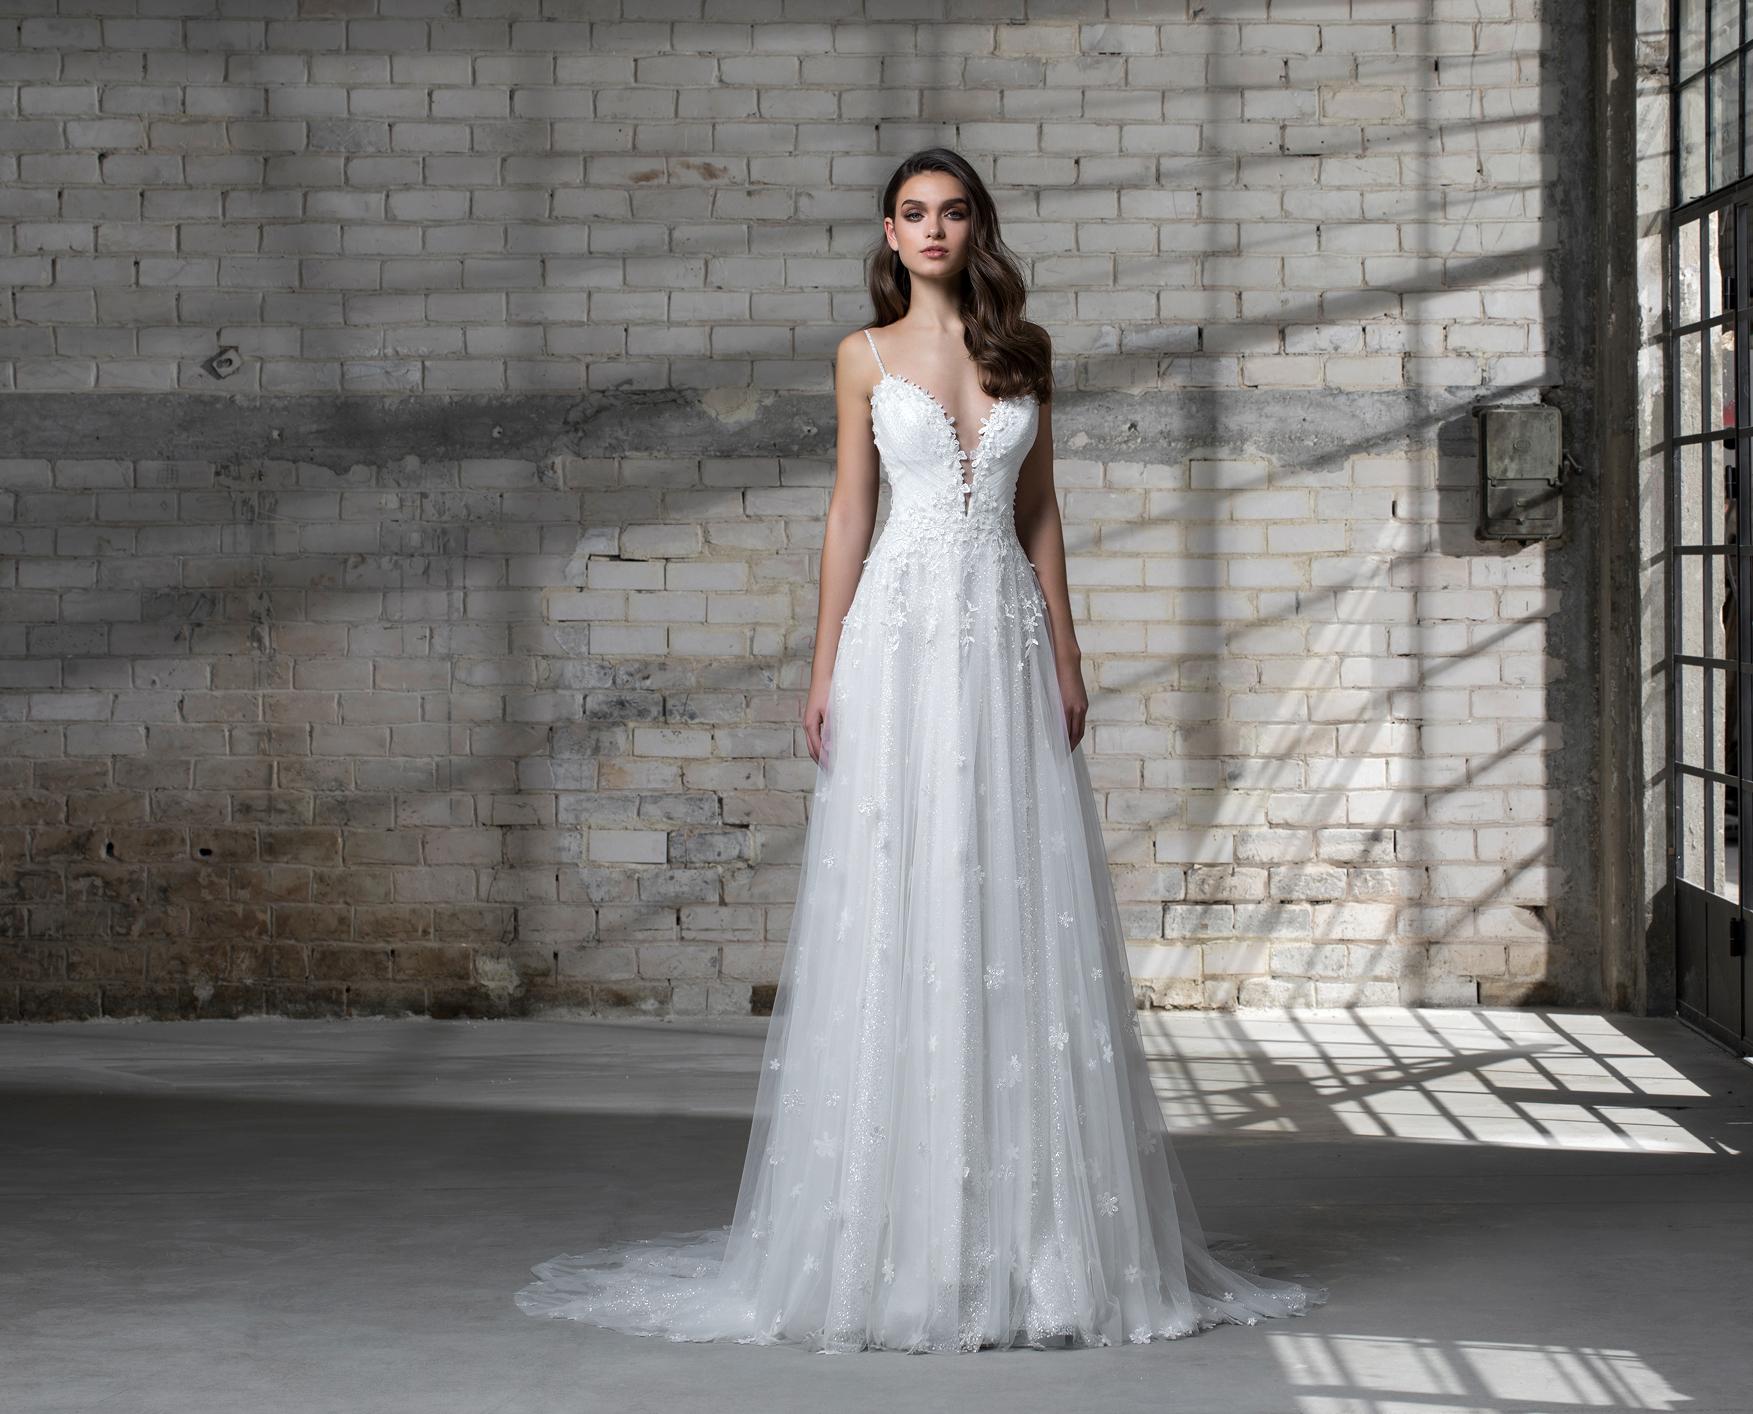 pnina tornai wedding dress spring 2019 spaghetti strap a-line deep v